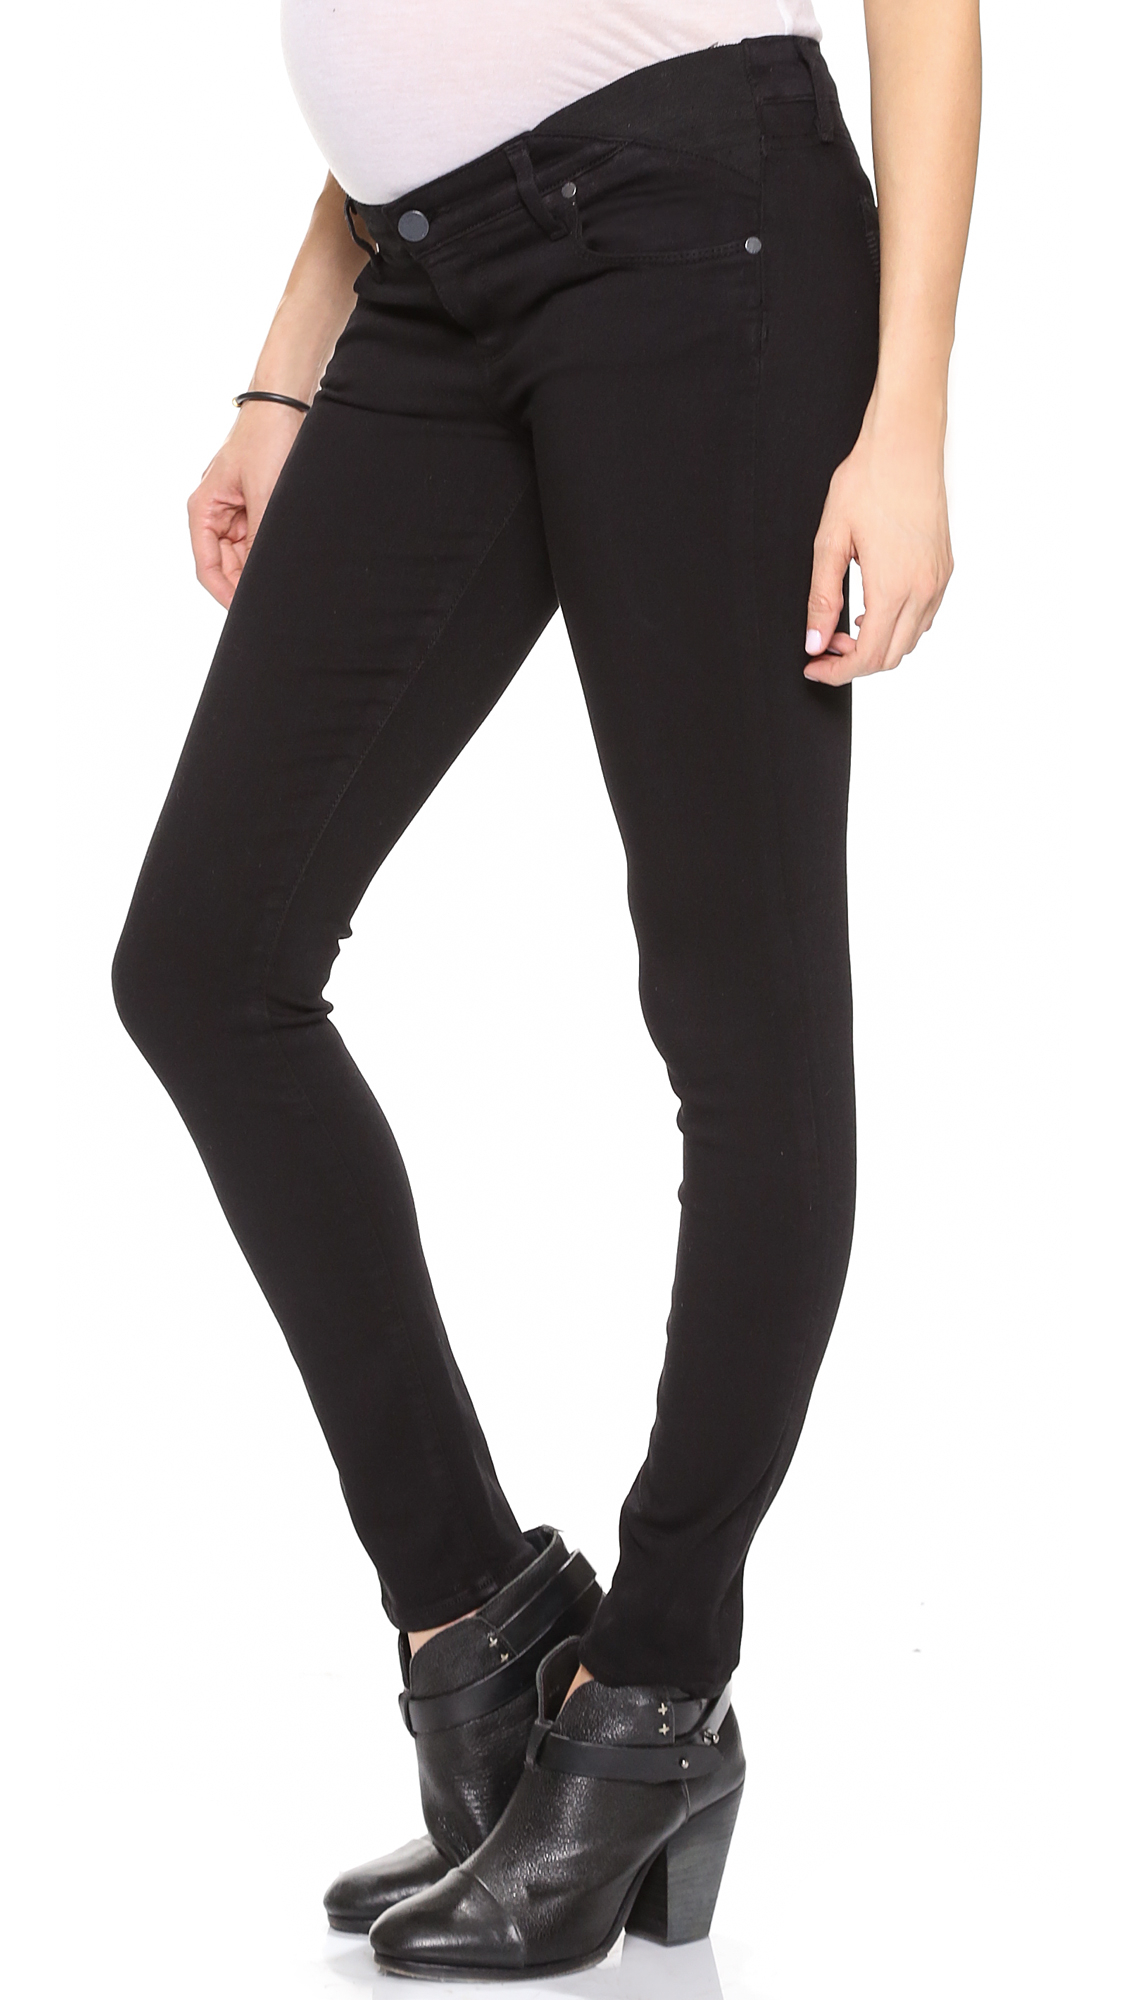 cf64e036f2280 PAIGE Verdugo Ultra Skinny Maternity Jeans - Black Overdye in Black ...